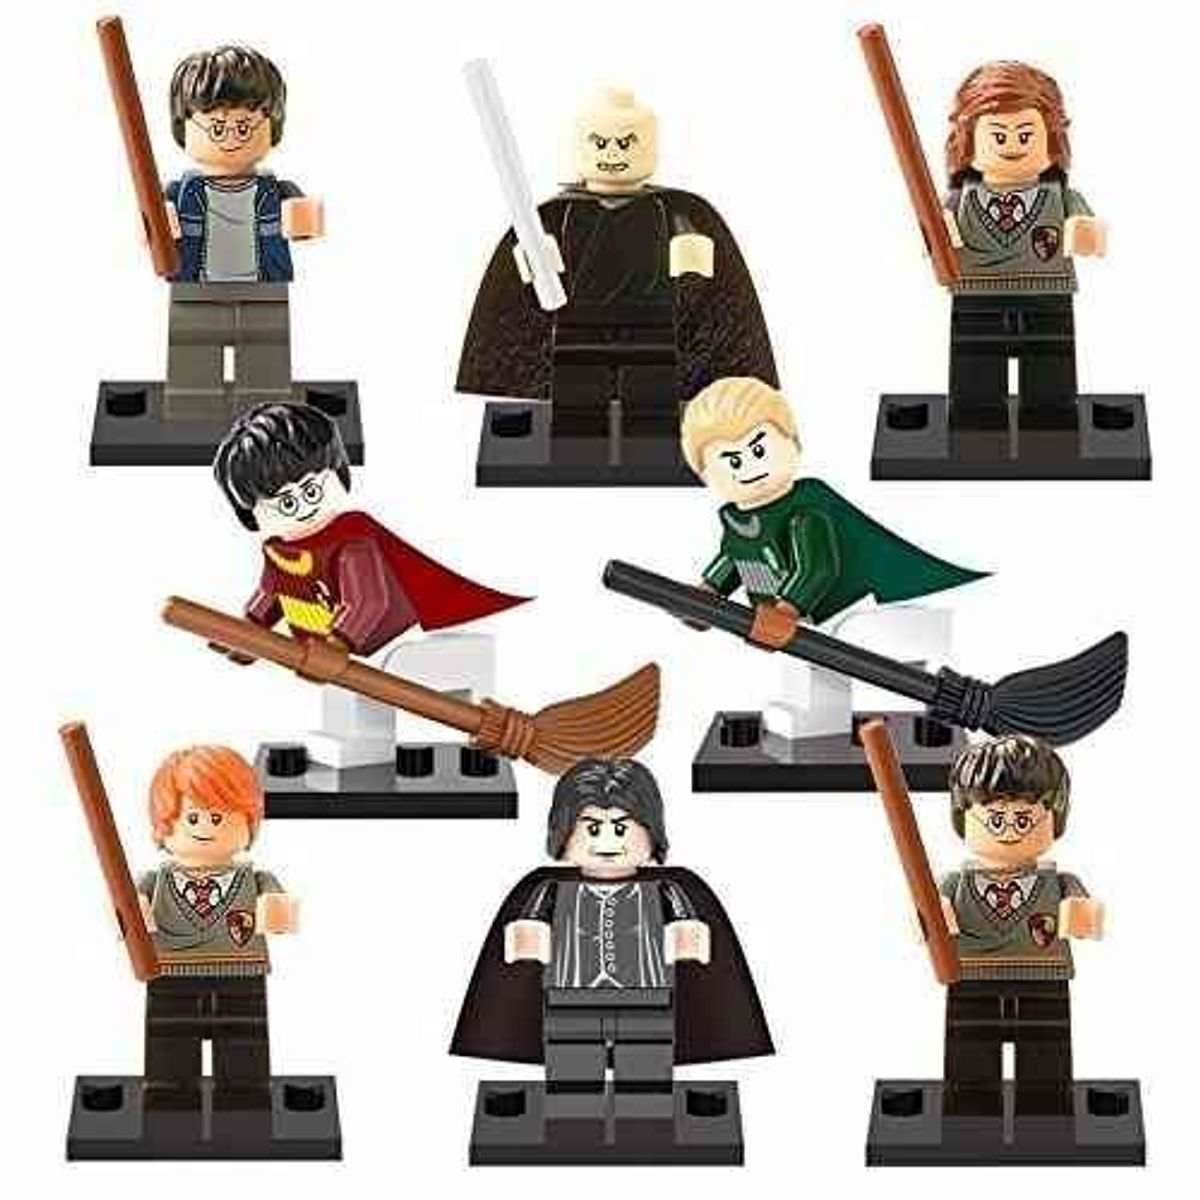 lote blocos de construção harry potter lord voldemort lego - pequeninos sem marca